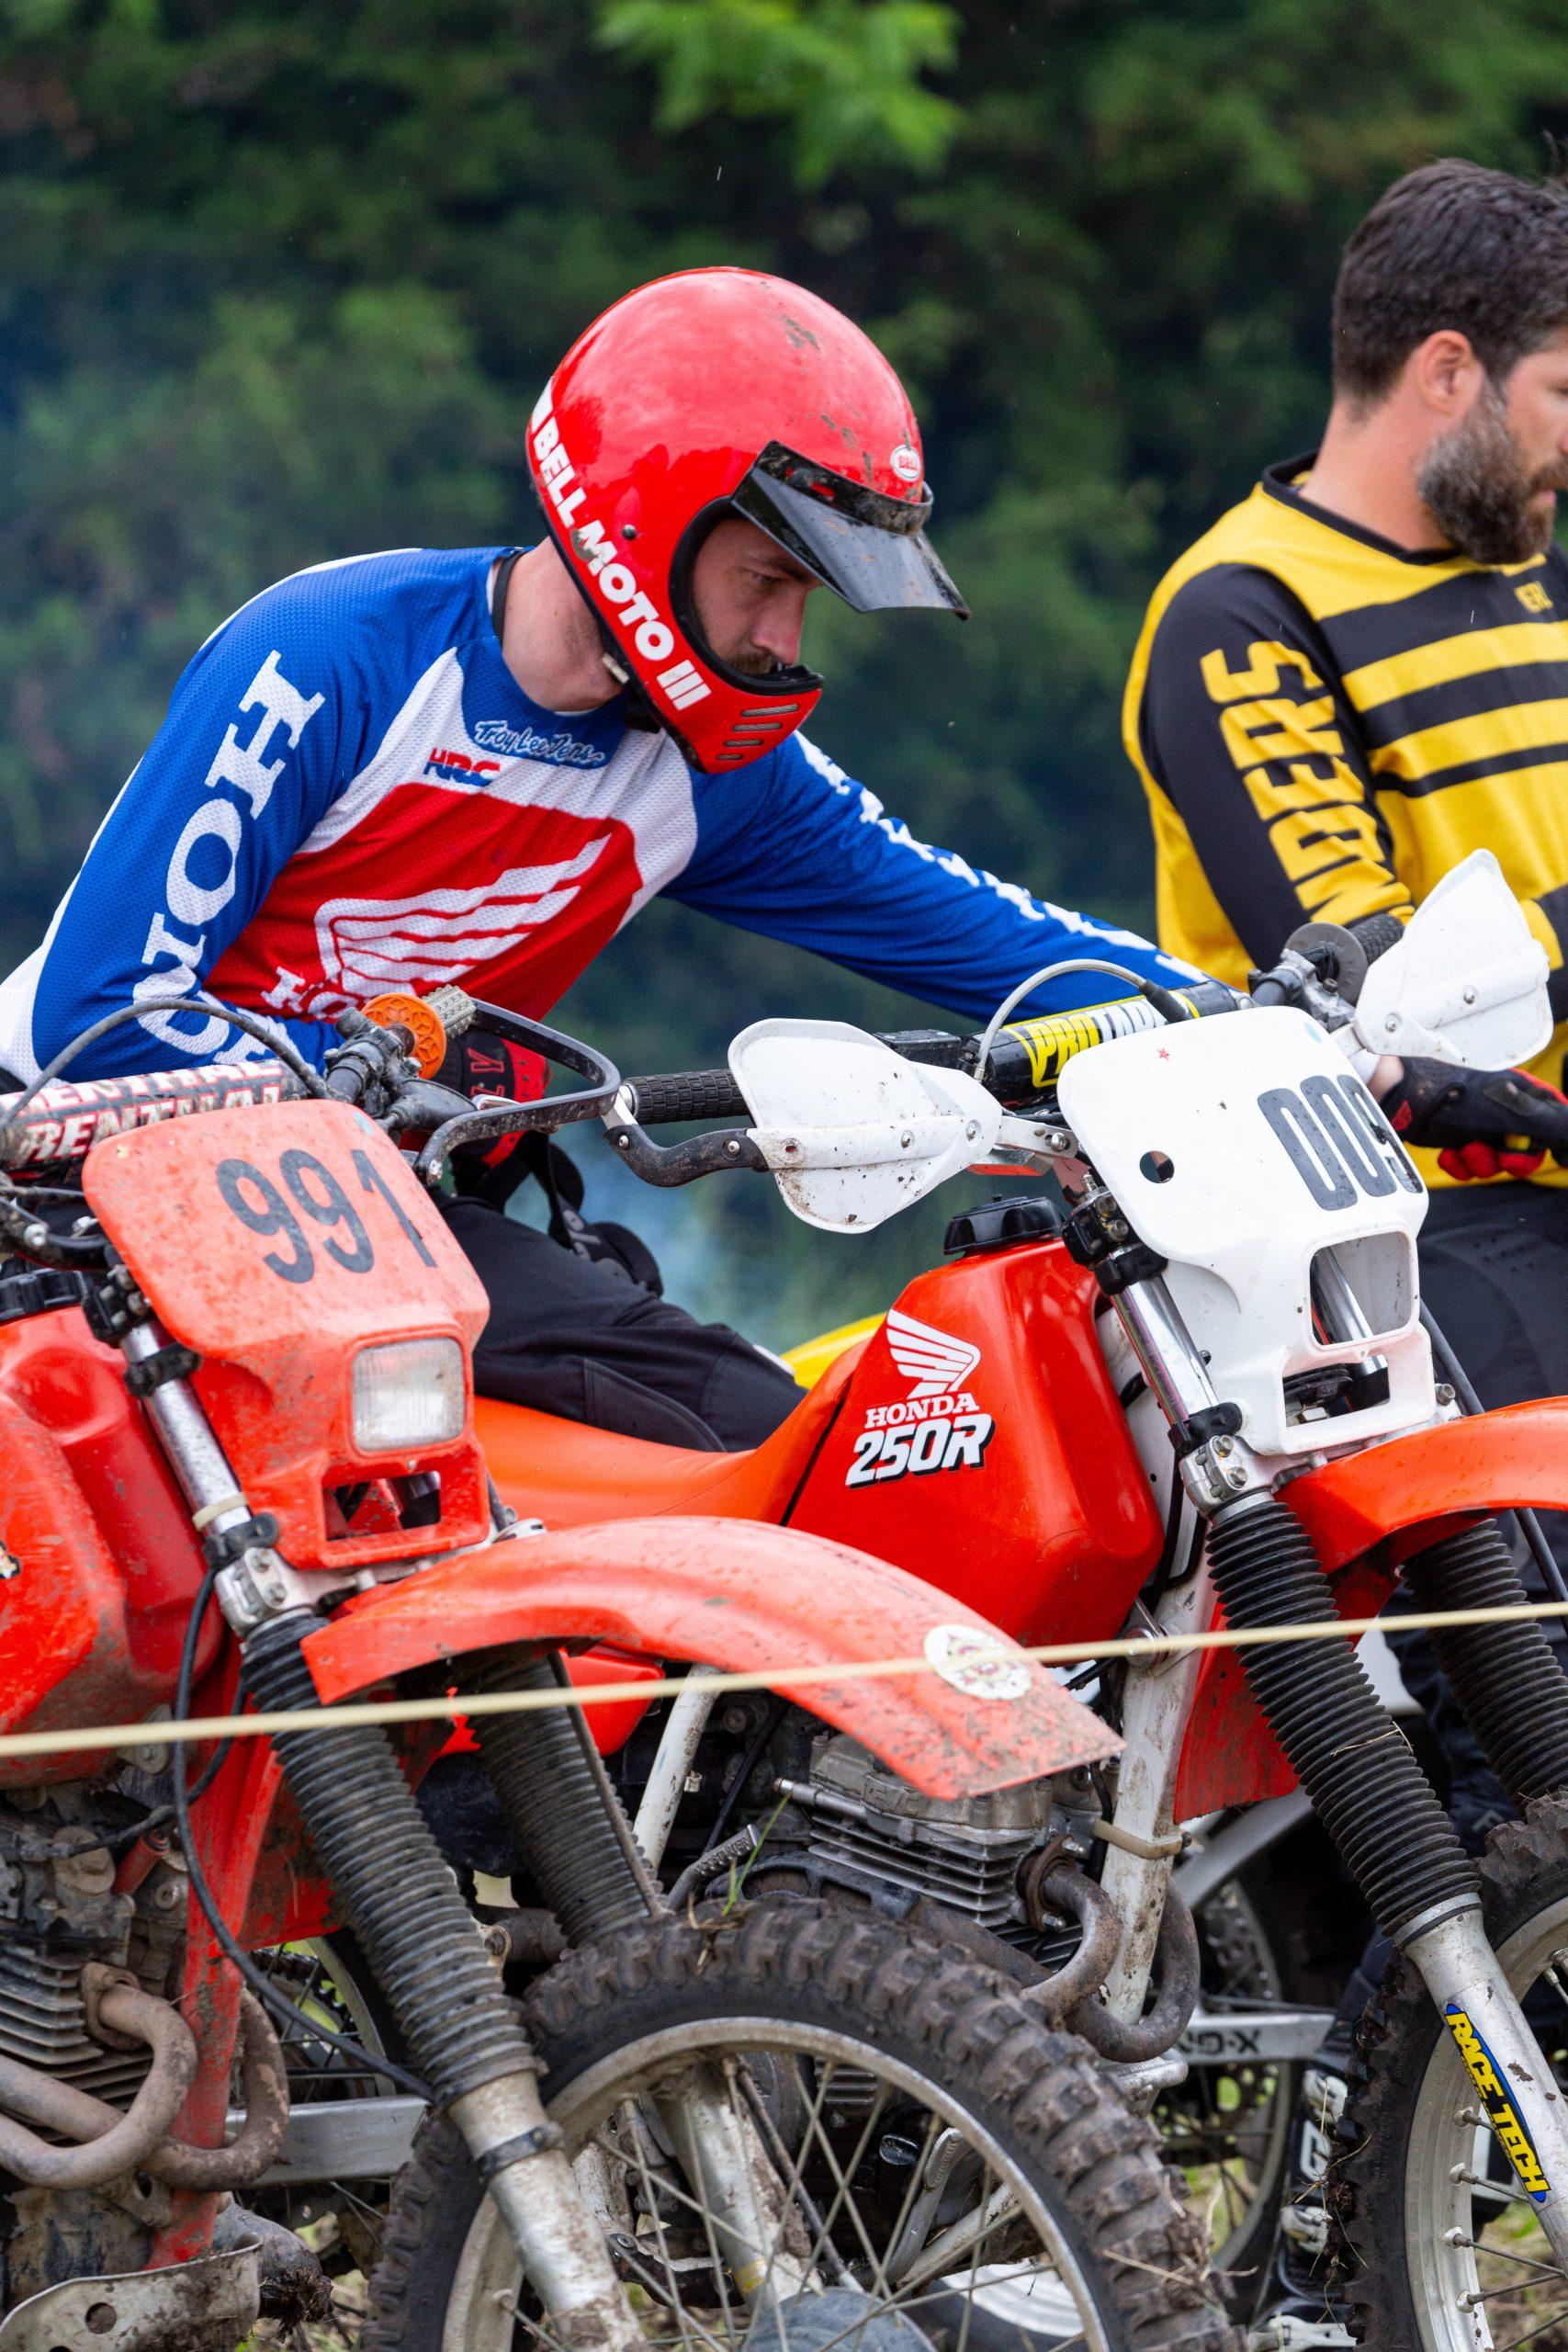 heartland motofest Kyle Smith MX starting prep